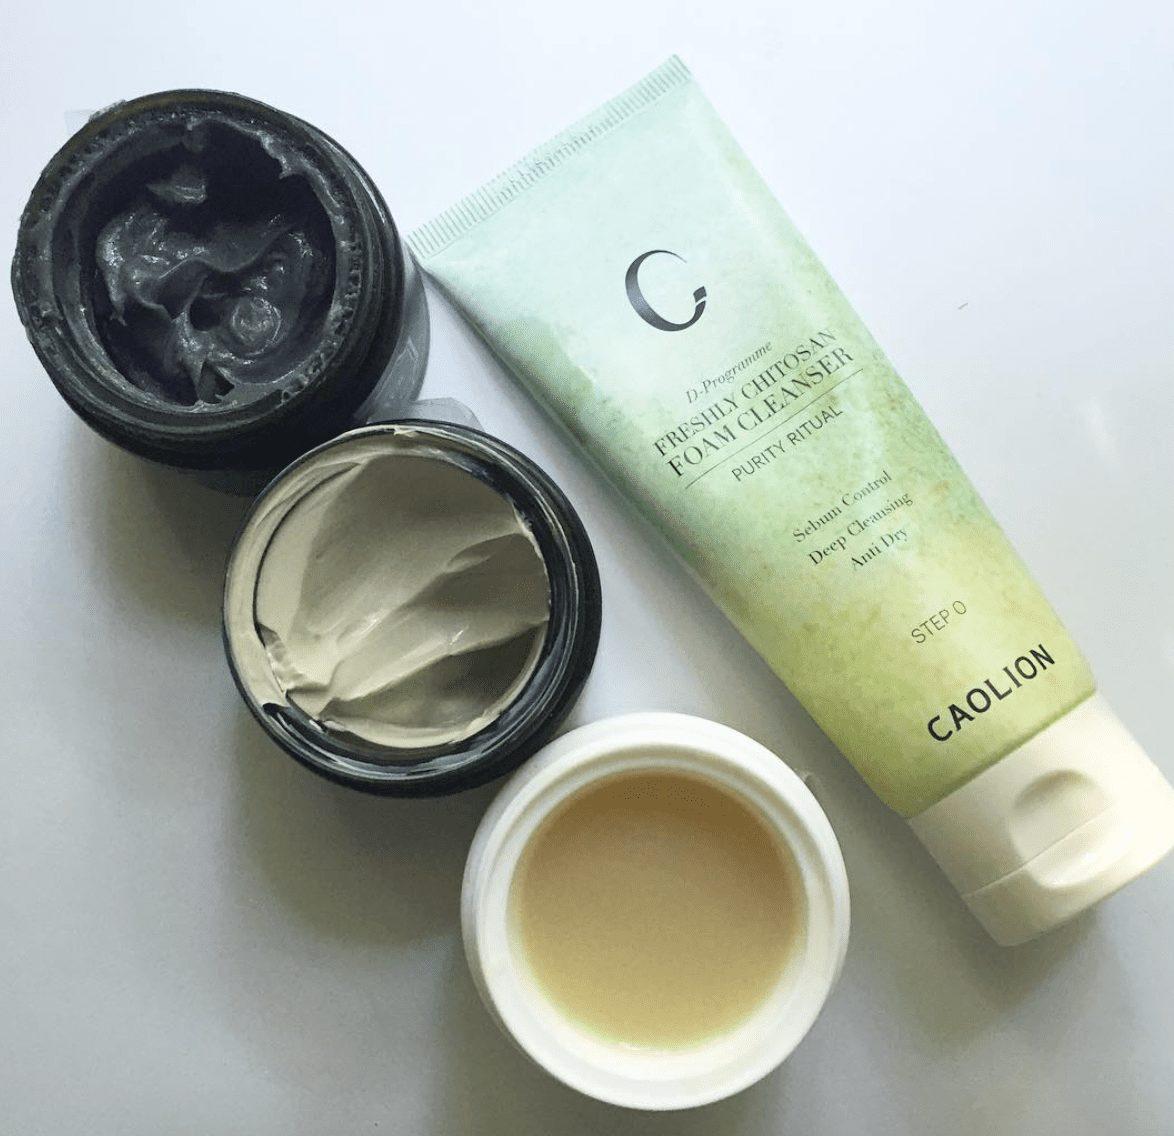 Caolion Perfect Pores Kit Review